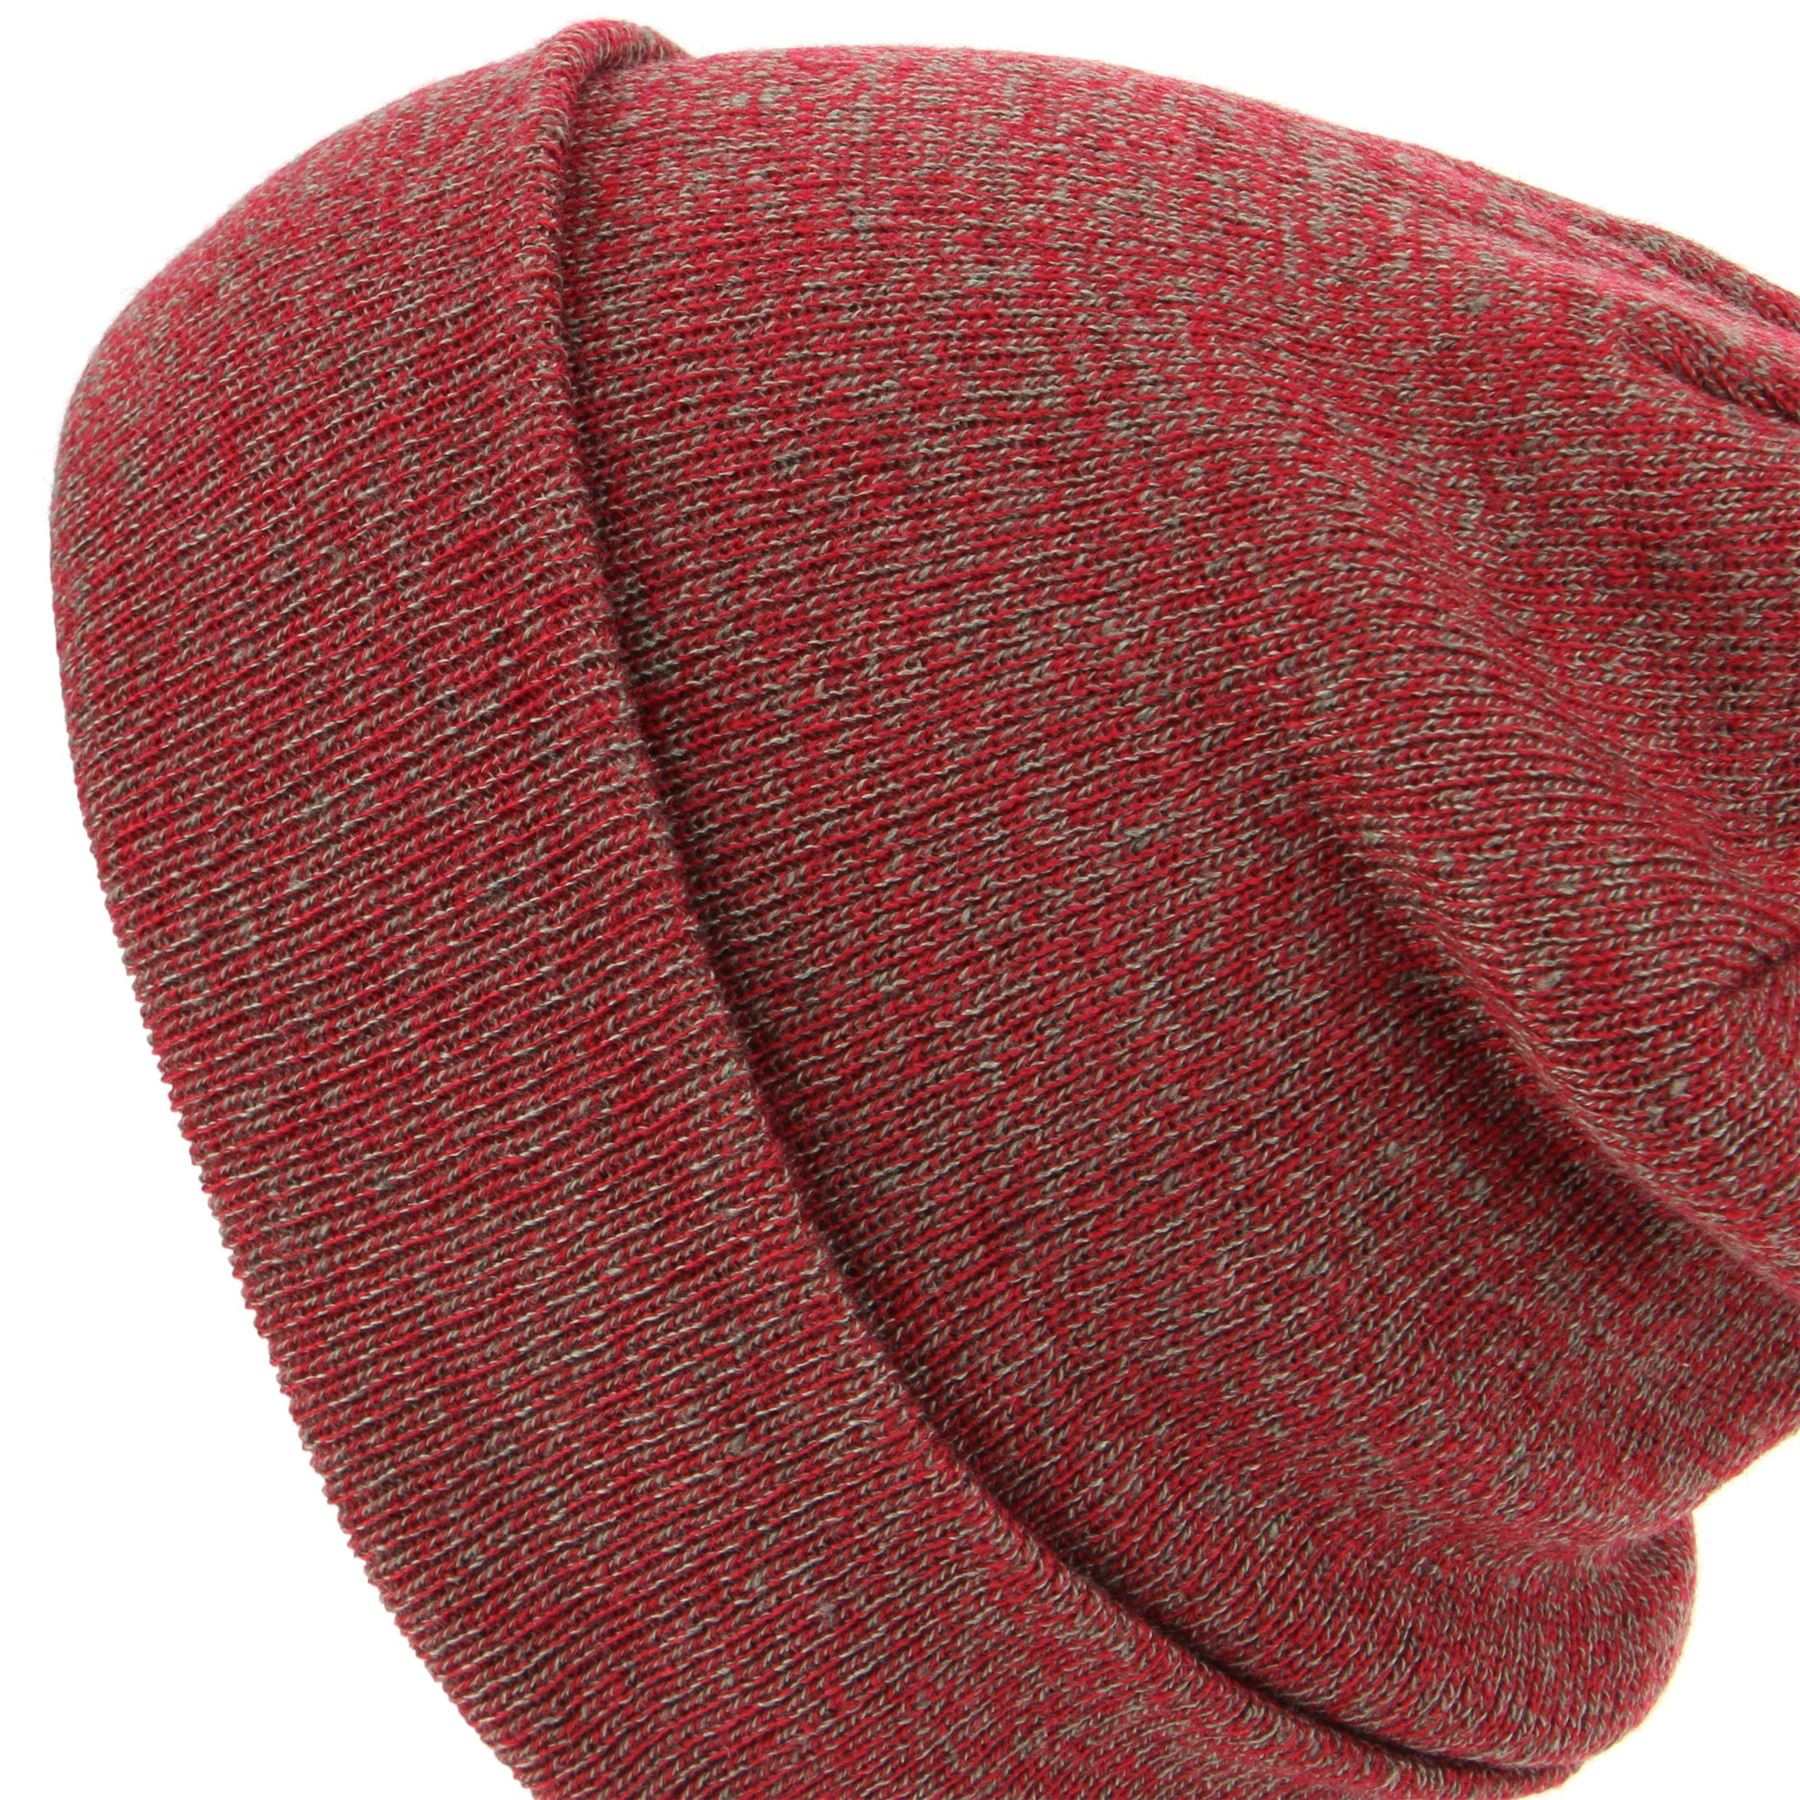 Beanie Hat Cap Warm Winter BLACK BLUE RED Marl Hawkins Men Ladies Knit Unisex